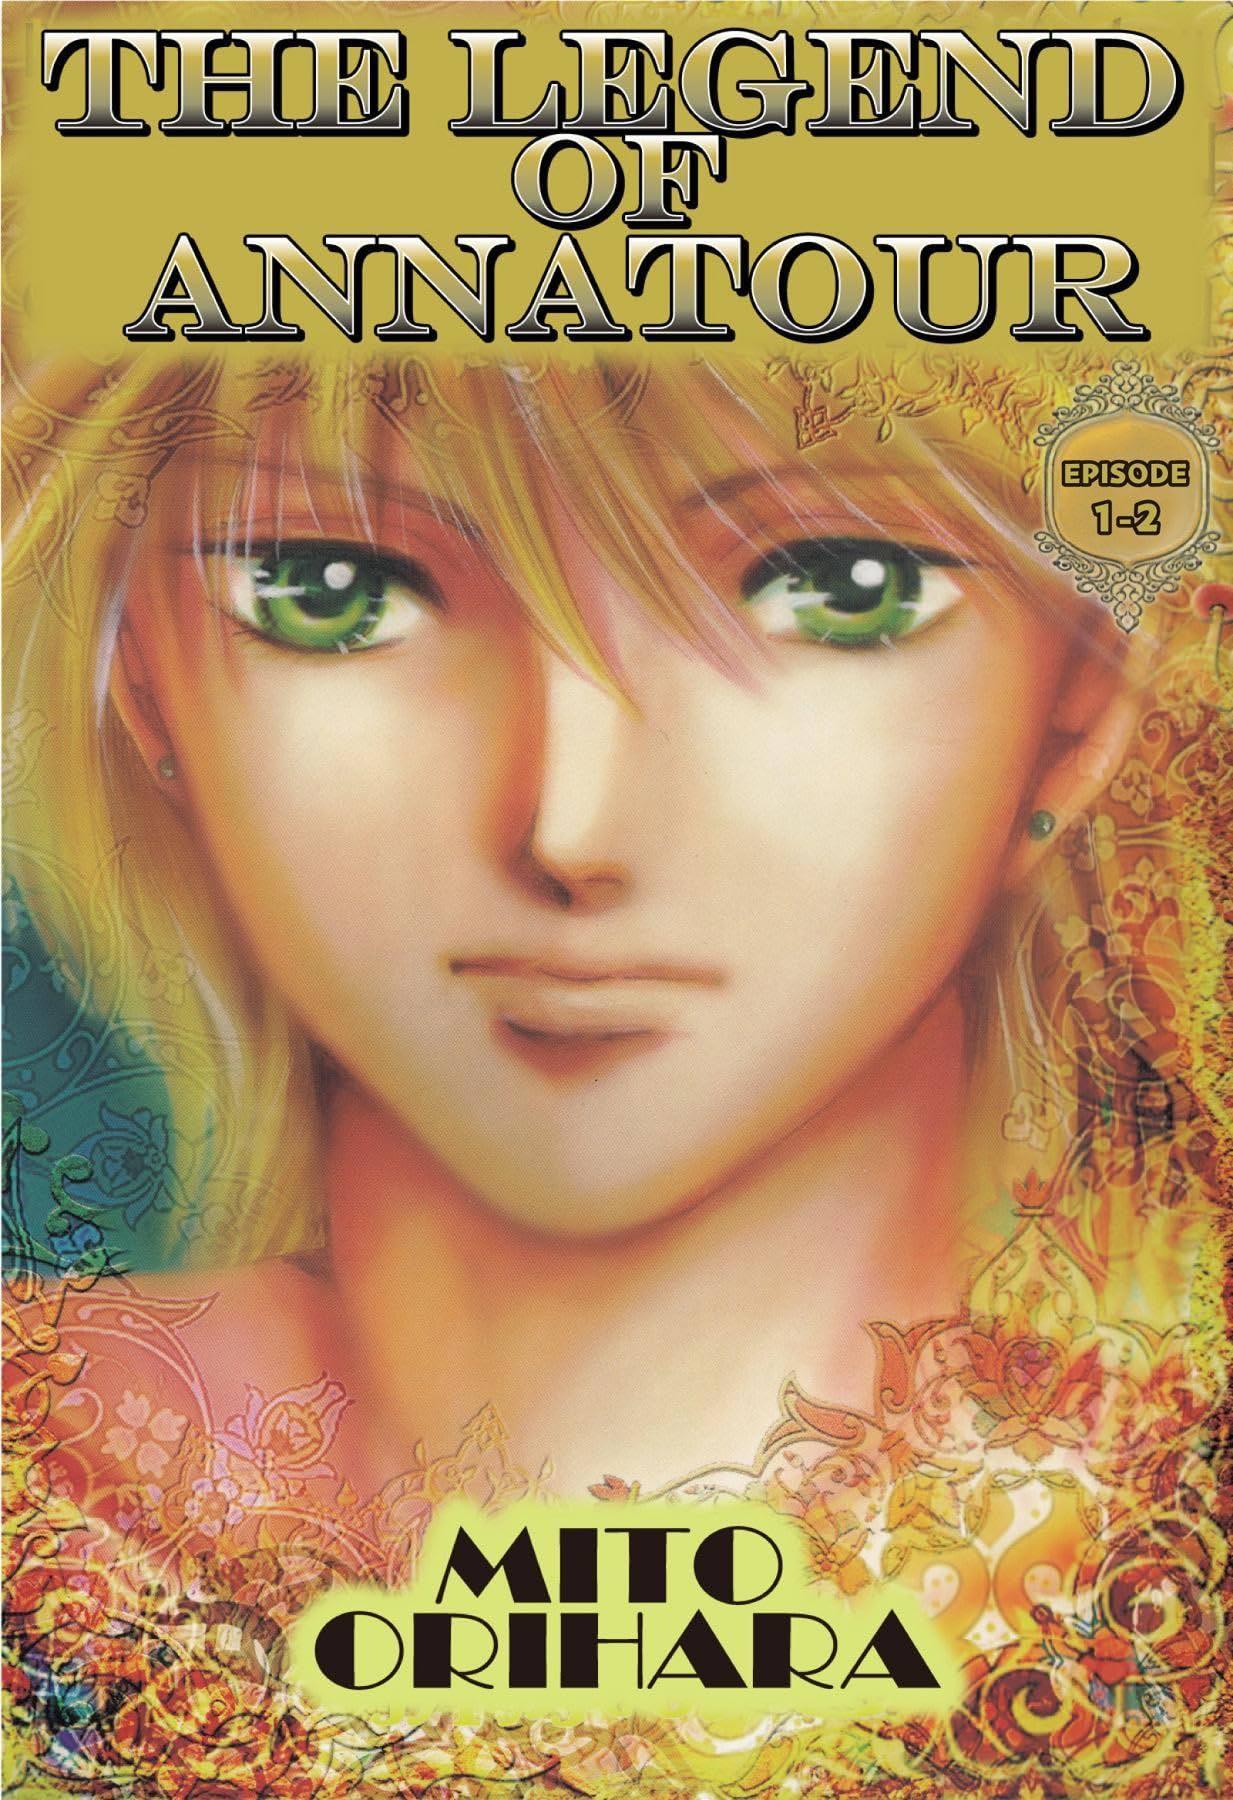 THE LEGEND OF ANNATOUR #2